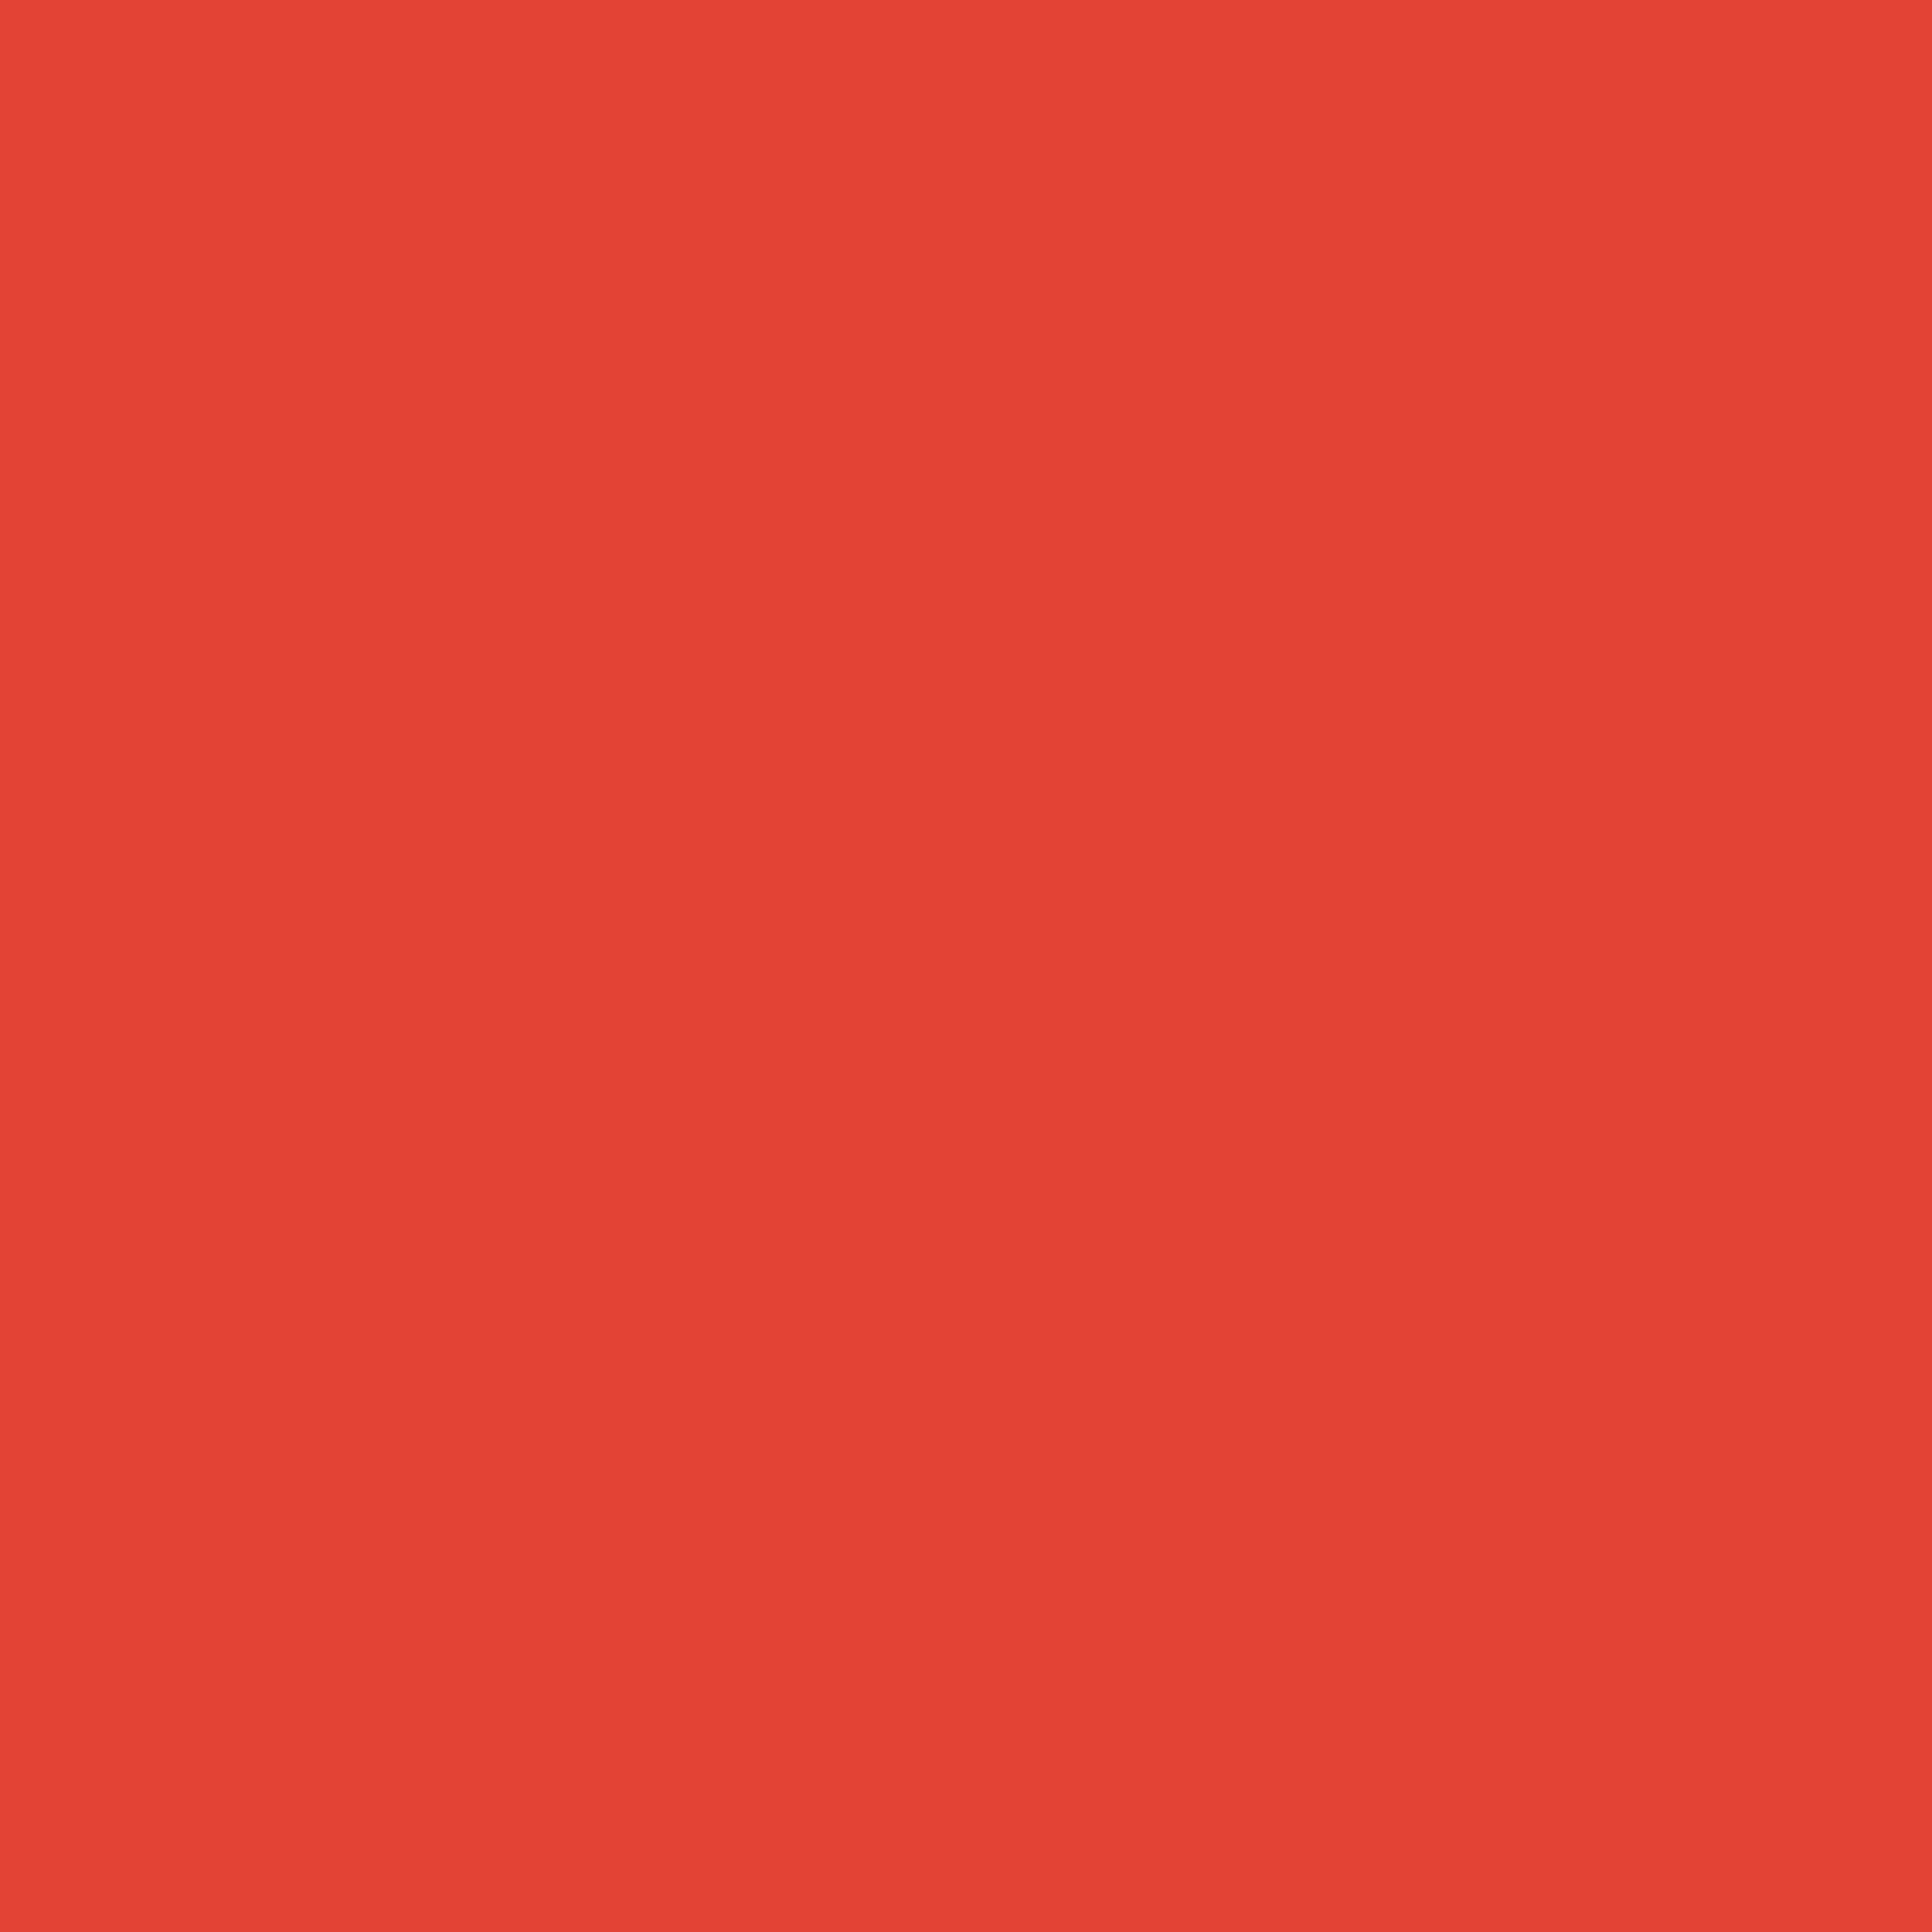 3600x3600 Vermilion Cinnabar Solid Color Background